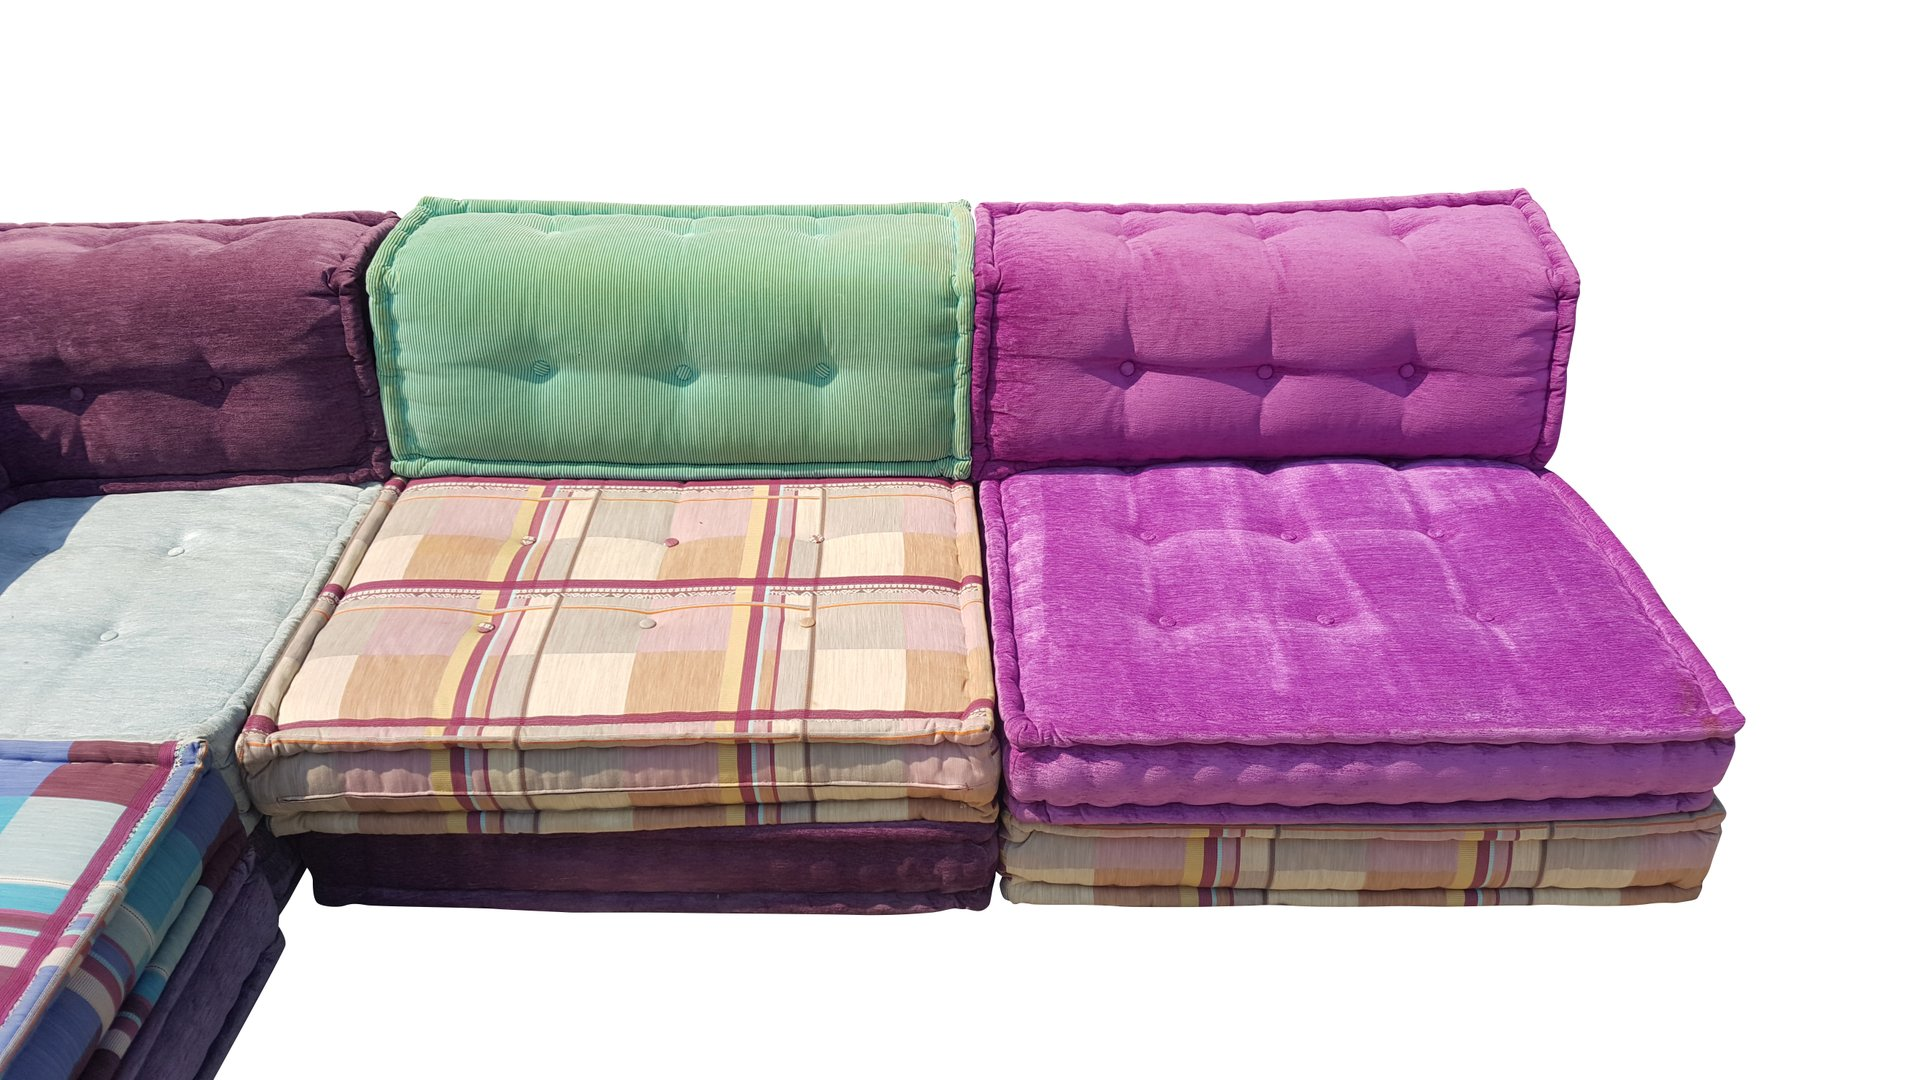 modulares mah jong sofa von hopfer hans f r roche bobois. Black Bedroom Furniture Sets. Home Design Ideas